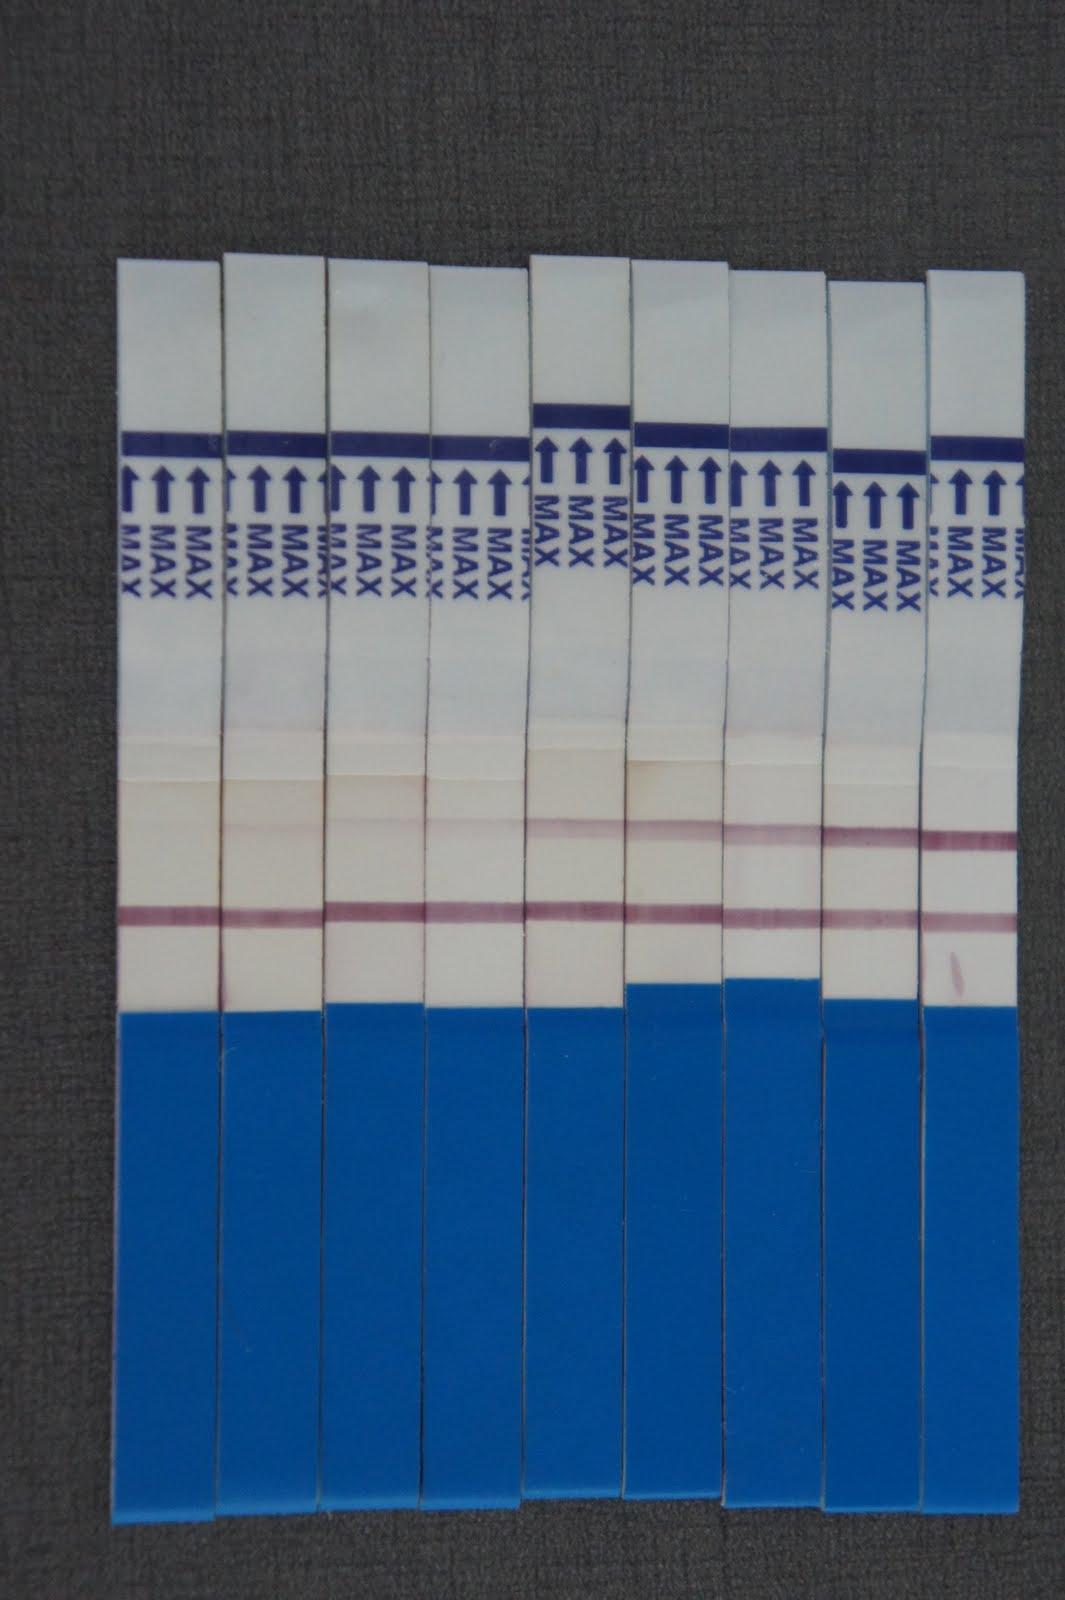 Testlagret graviditetstest hur tidigt fd36573f06fc8